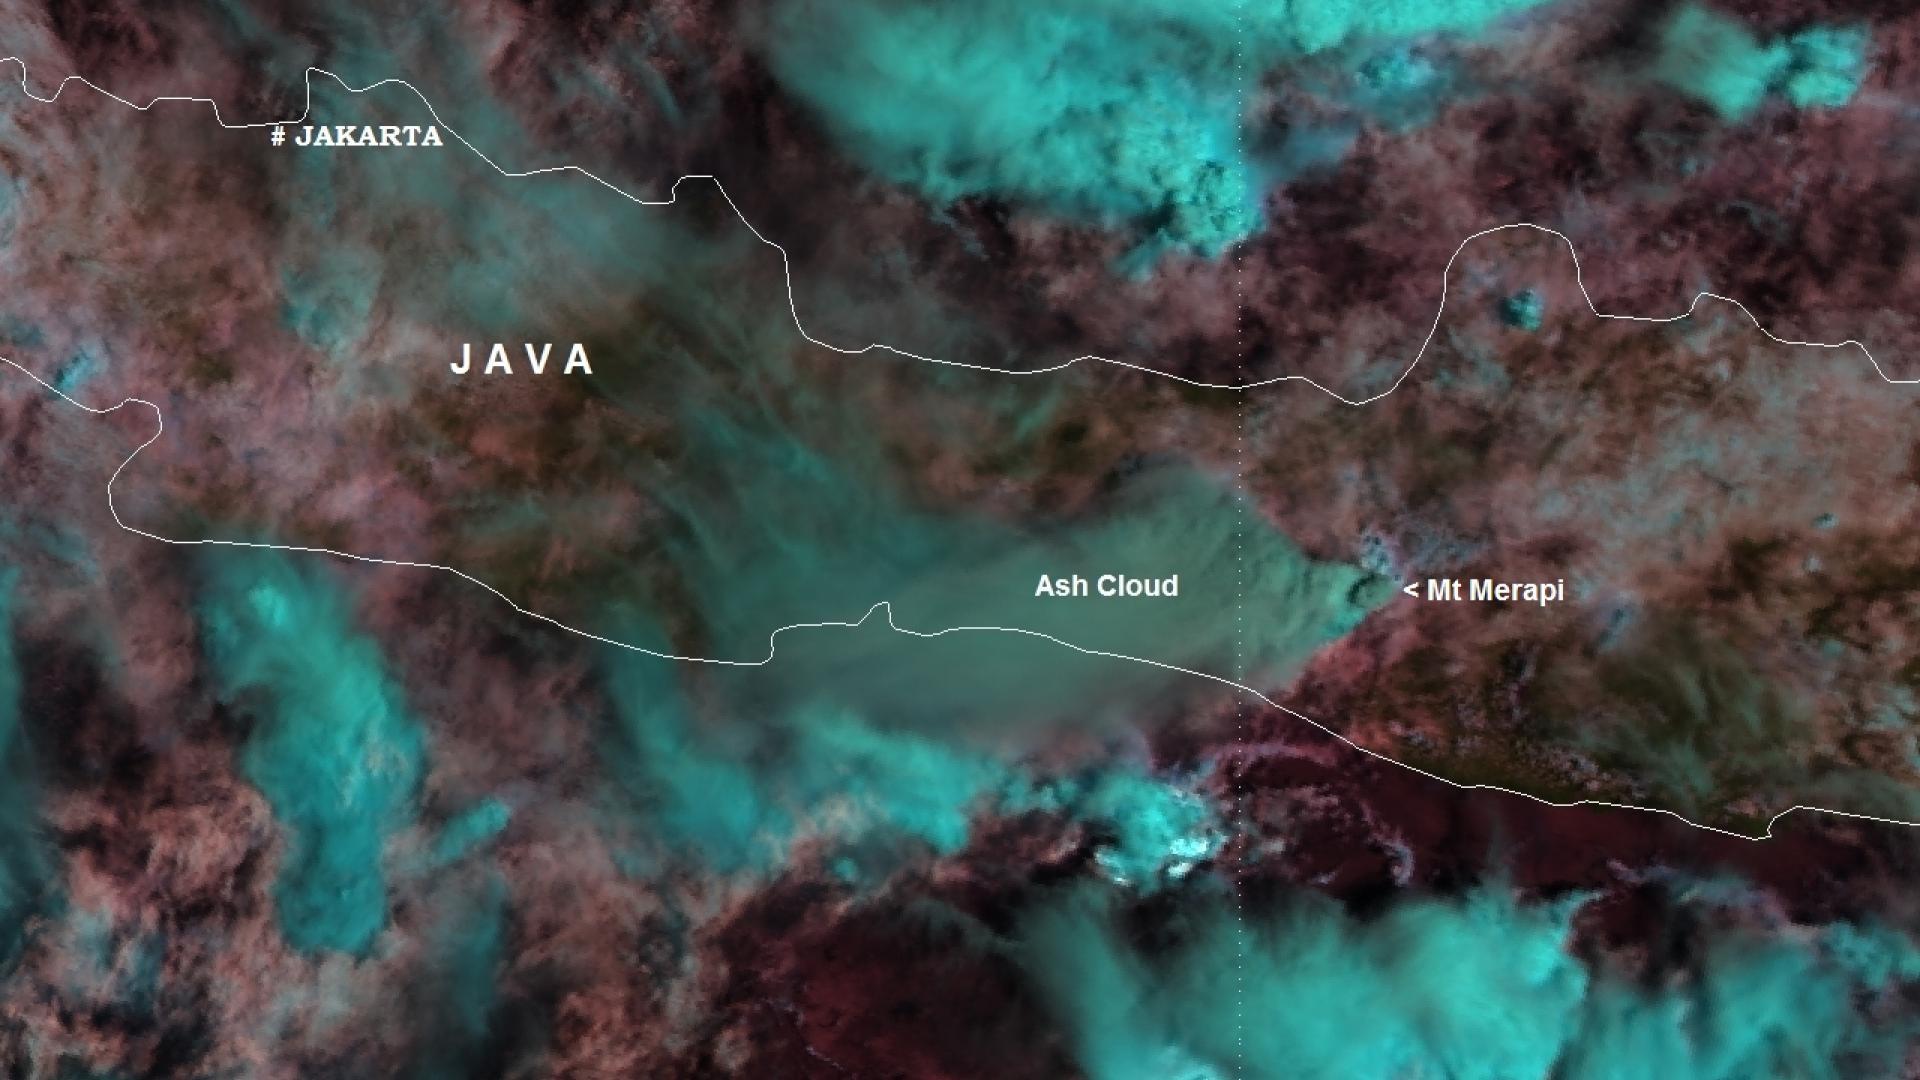 Mt Merapi (Java, Indonesia)